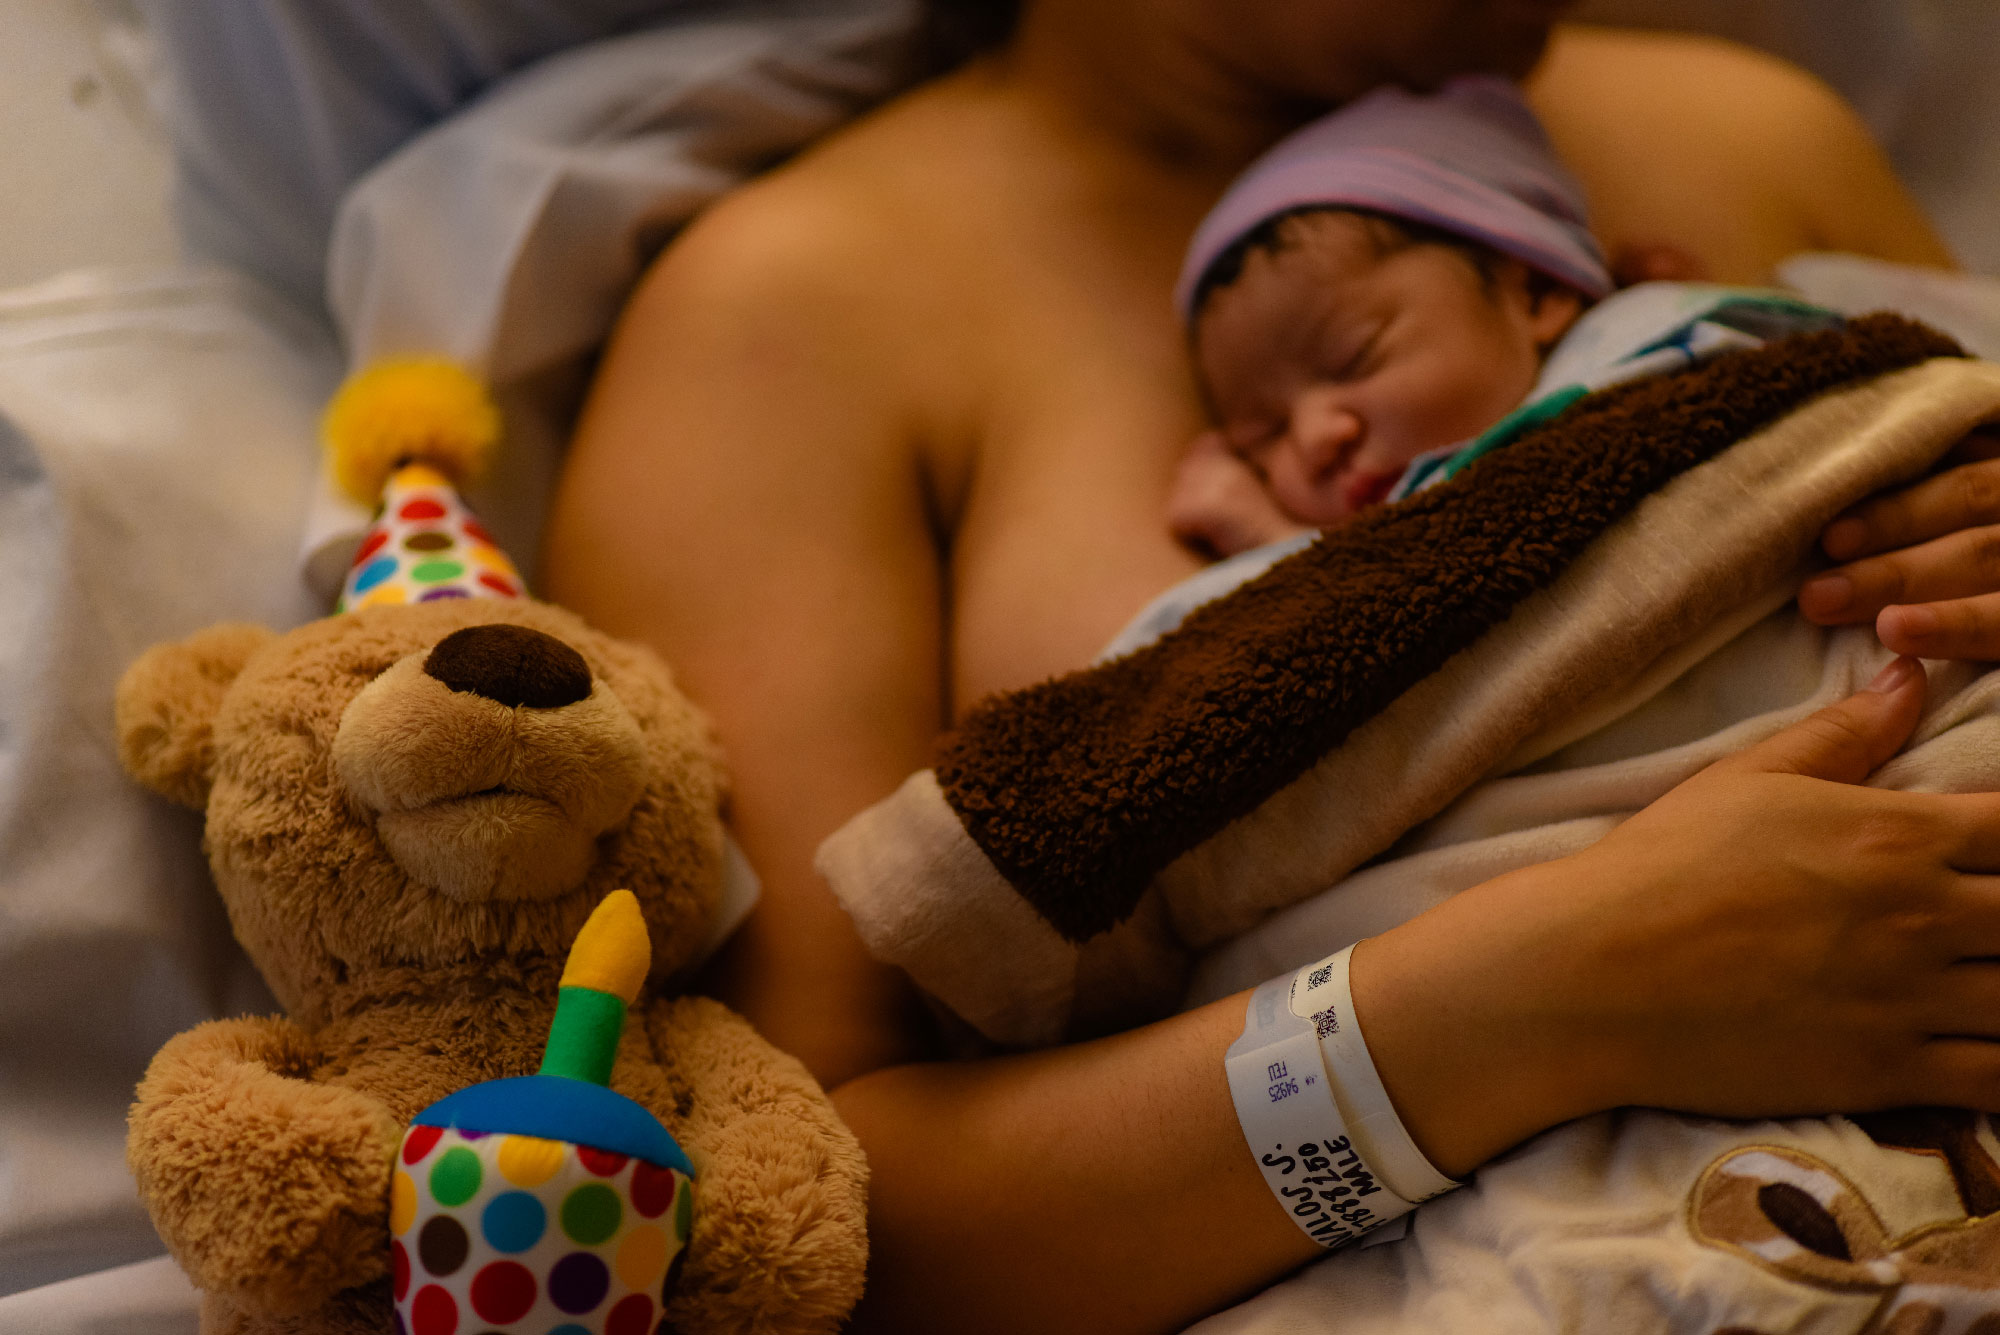 https://bworthyphotography.smugmug.com/BW-Website-Newborn-Session/Luke-James-Worthy